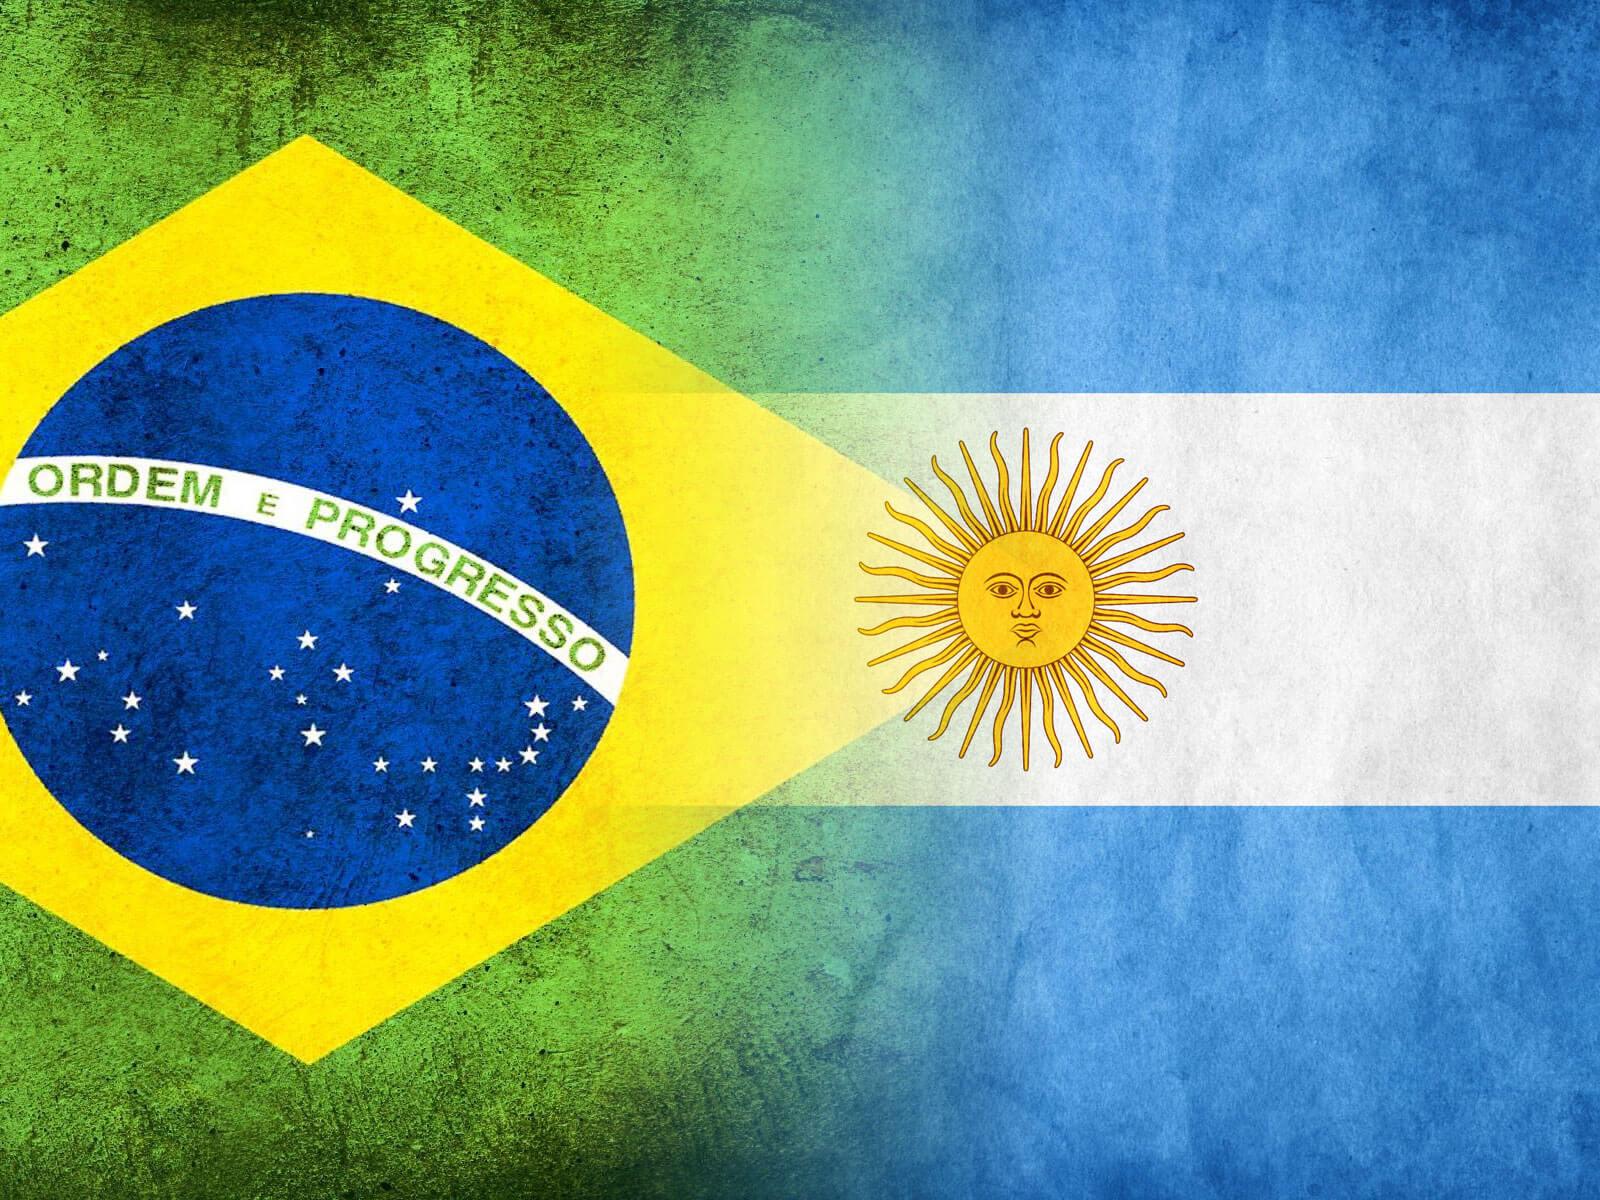 Streama Argentina & Brasilien i VM-kvalet live (Fotboll)